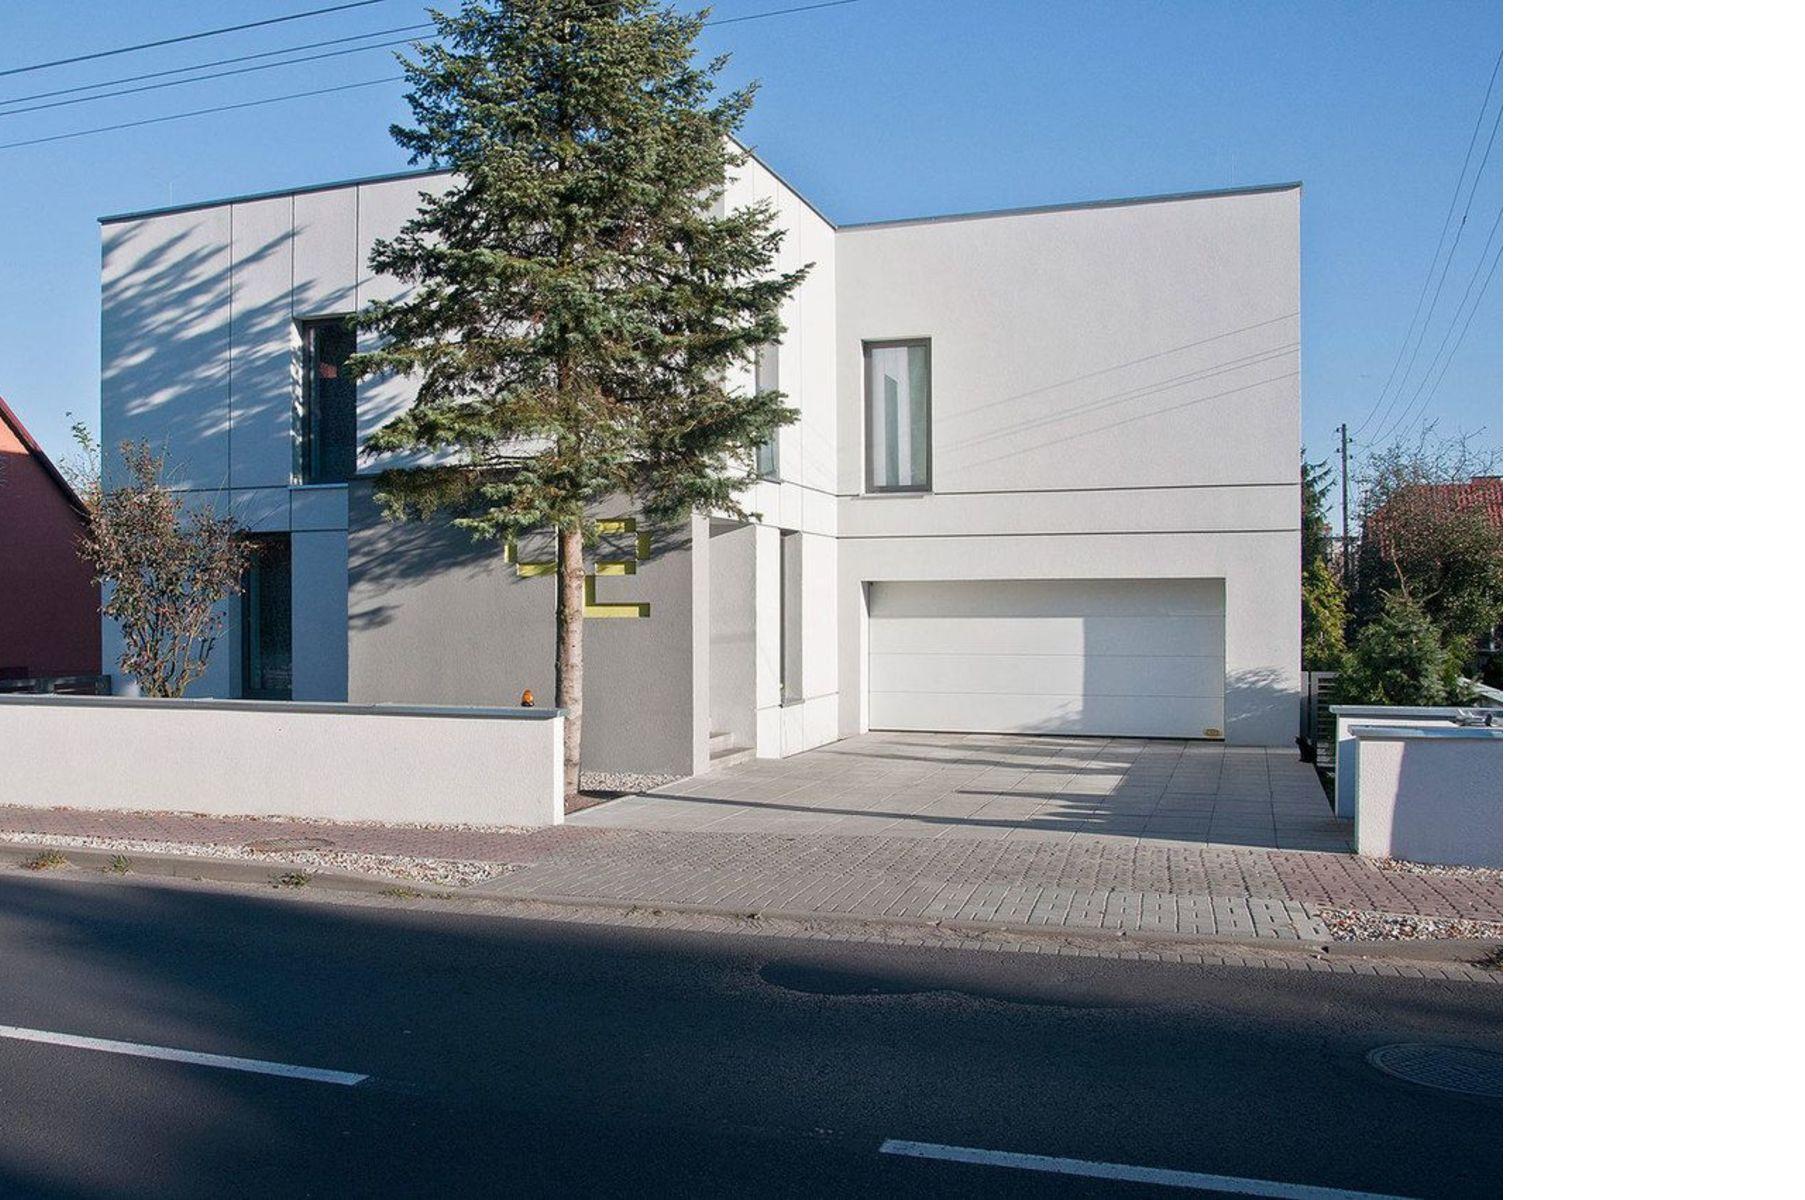 Rimodernare una casa anni 39 70 pl architekci livegreenblog for Rimodernare casa